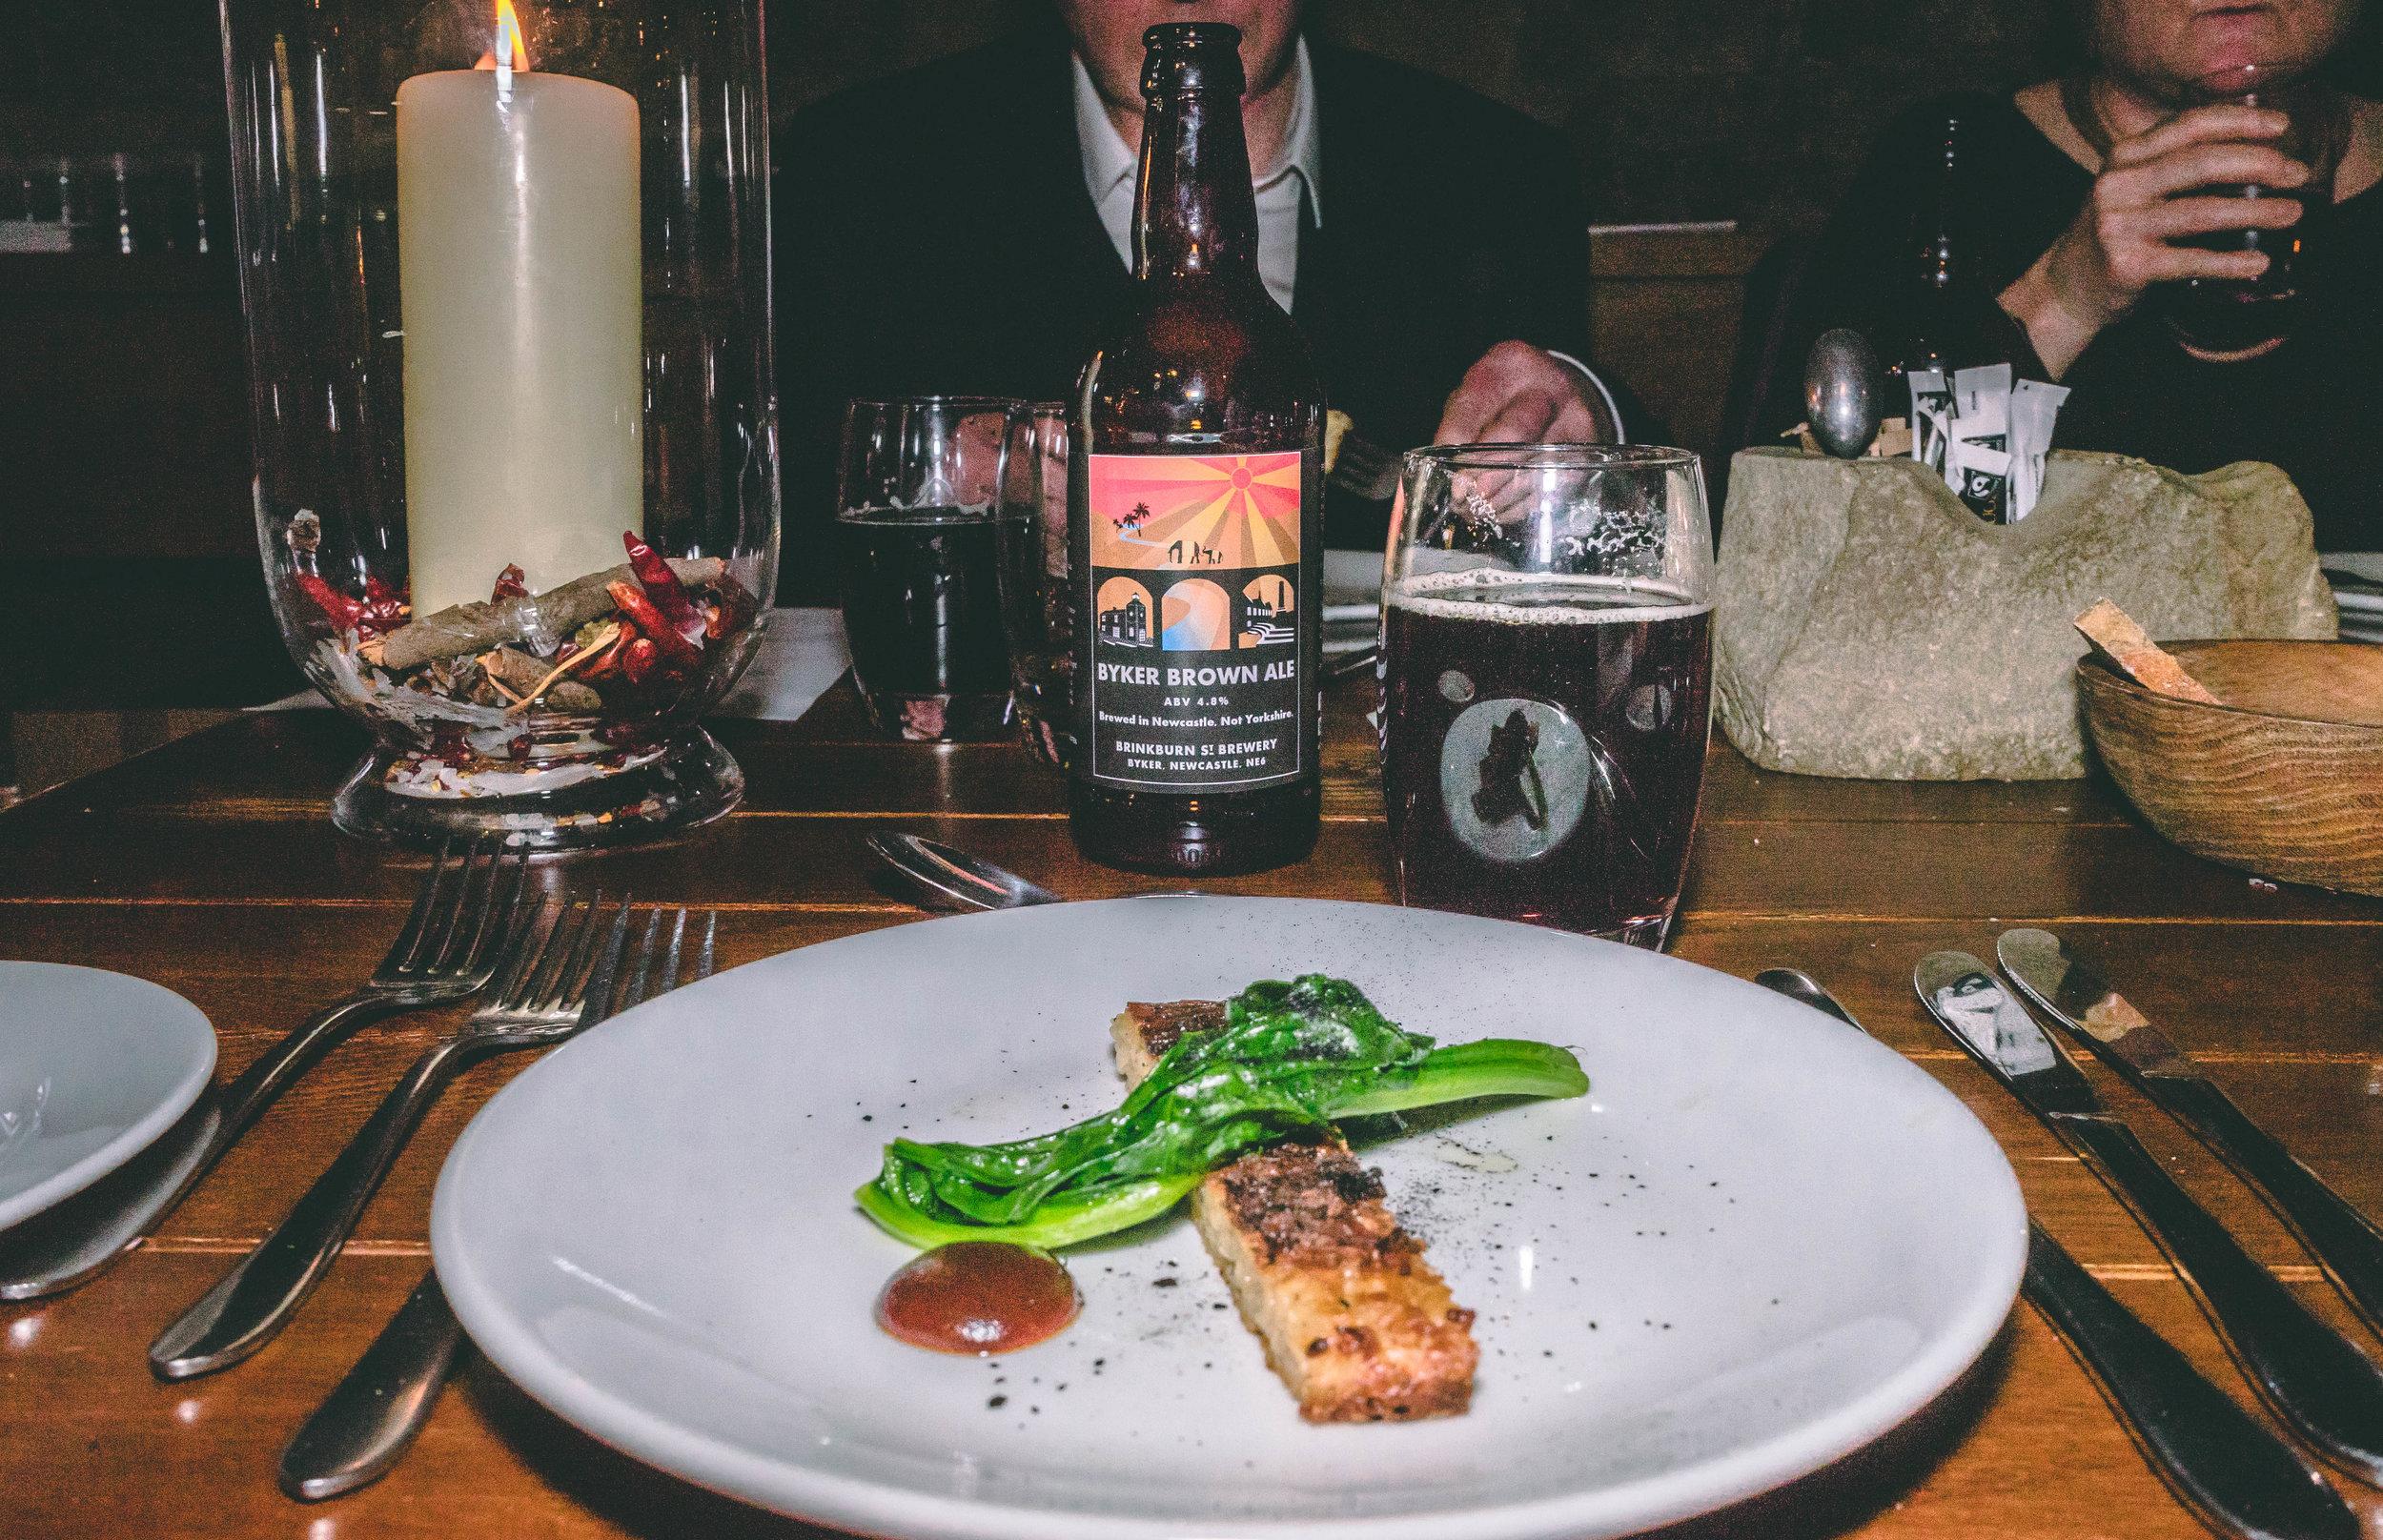 Gateshead floddie, spinach & broon sauce with Byker Brown Ale – 4.8%.jpg